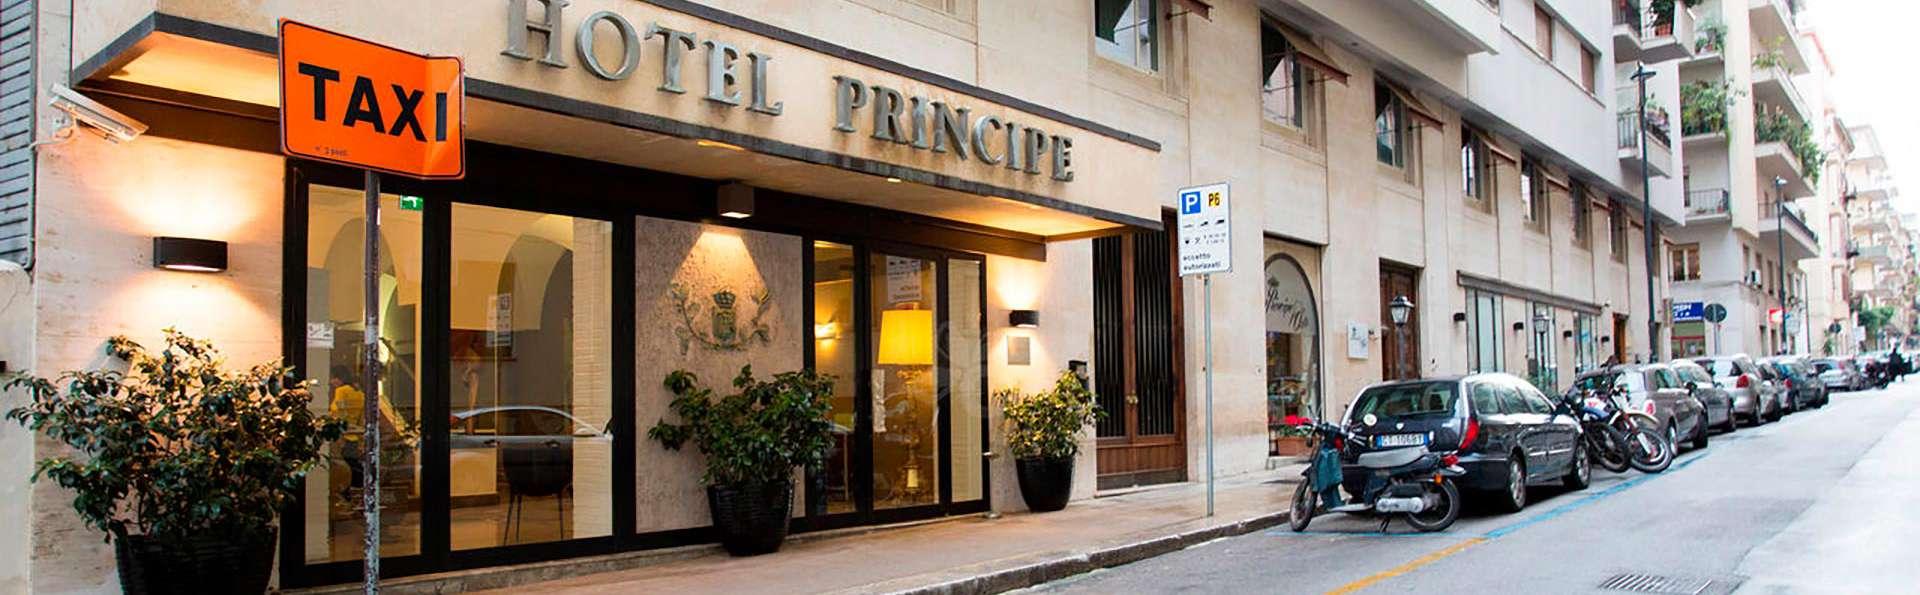 Hotel Principe di Villafranca - EDIT_FRONT_01.jpg